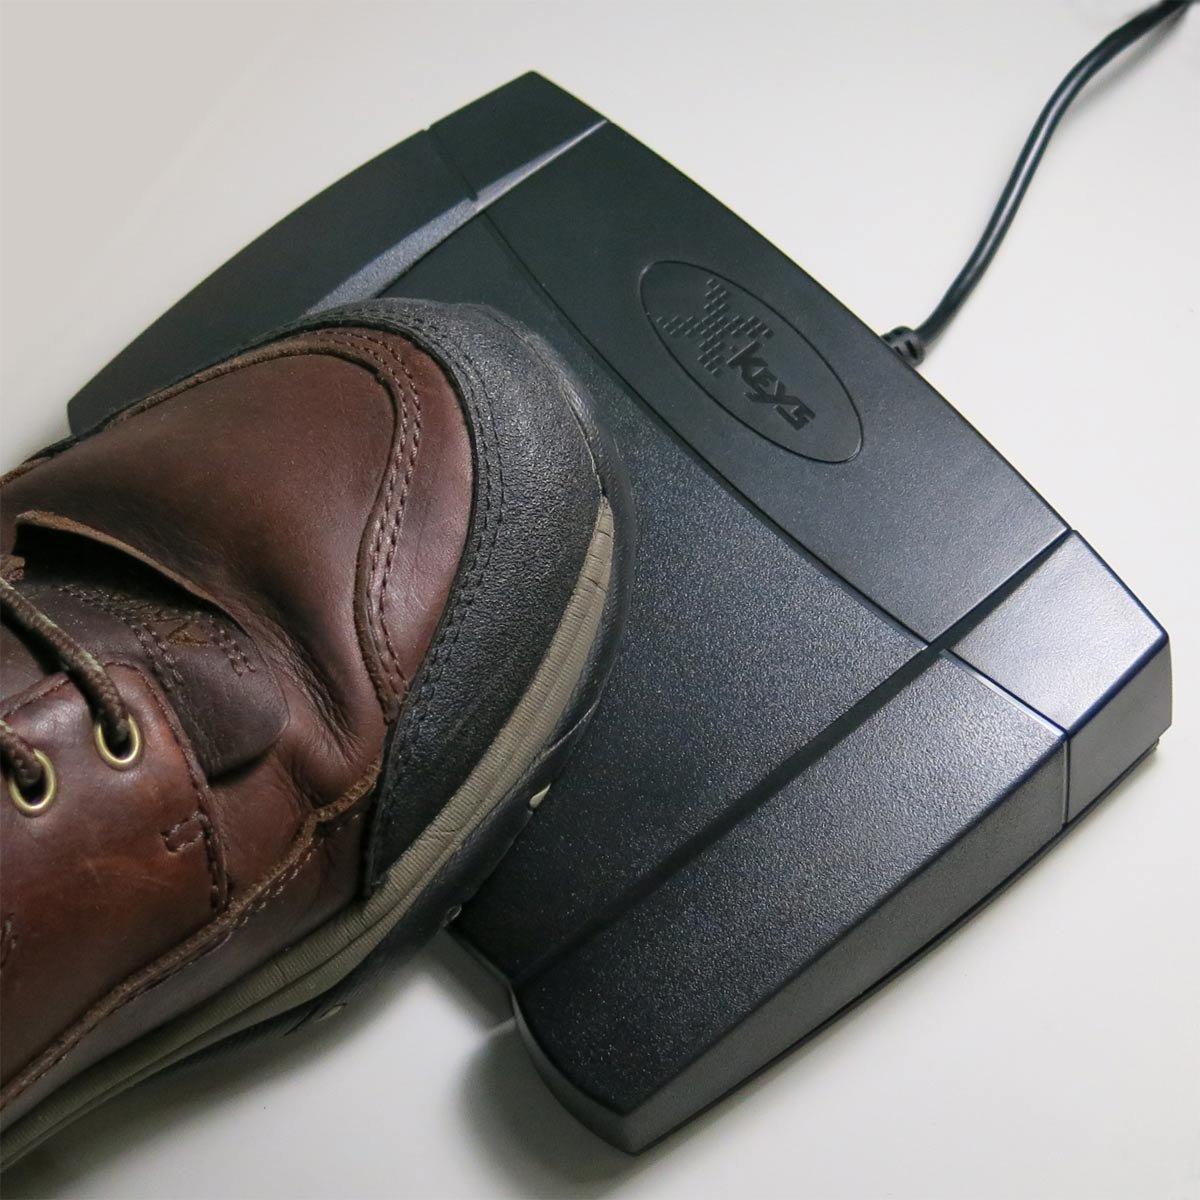 X-keys USB Foot Pedal for Playback Control